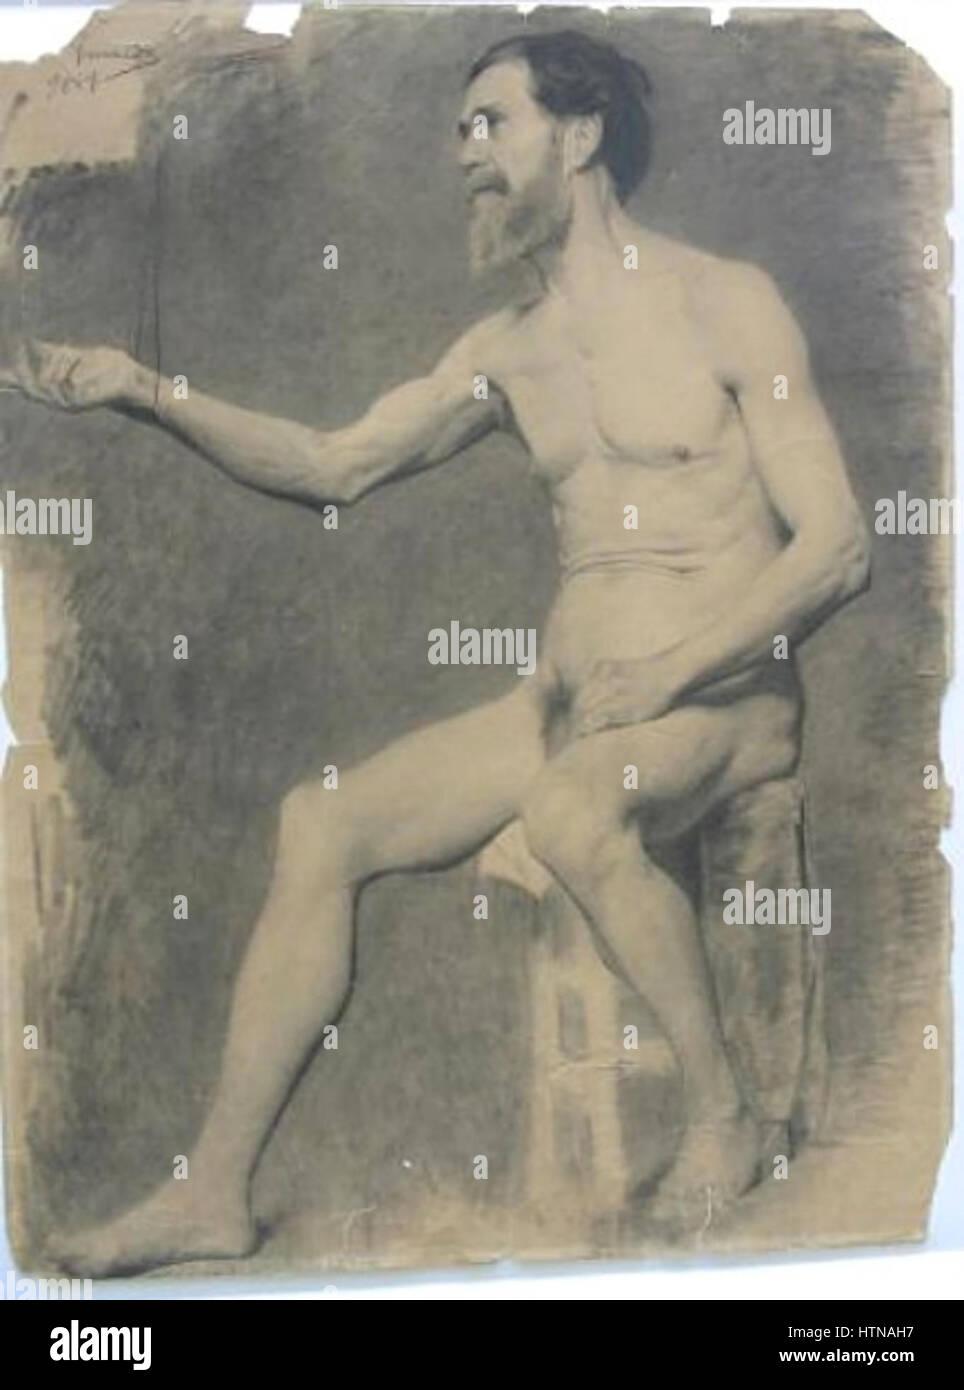 Rodolfo Amoedo - Nu masculino sentado Imagen De Stock